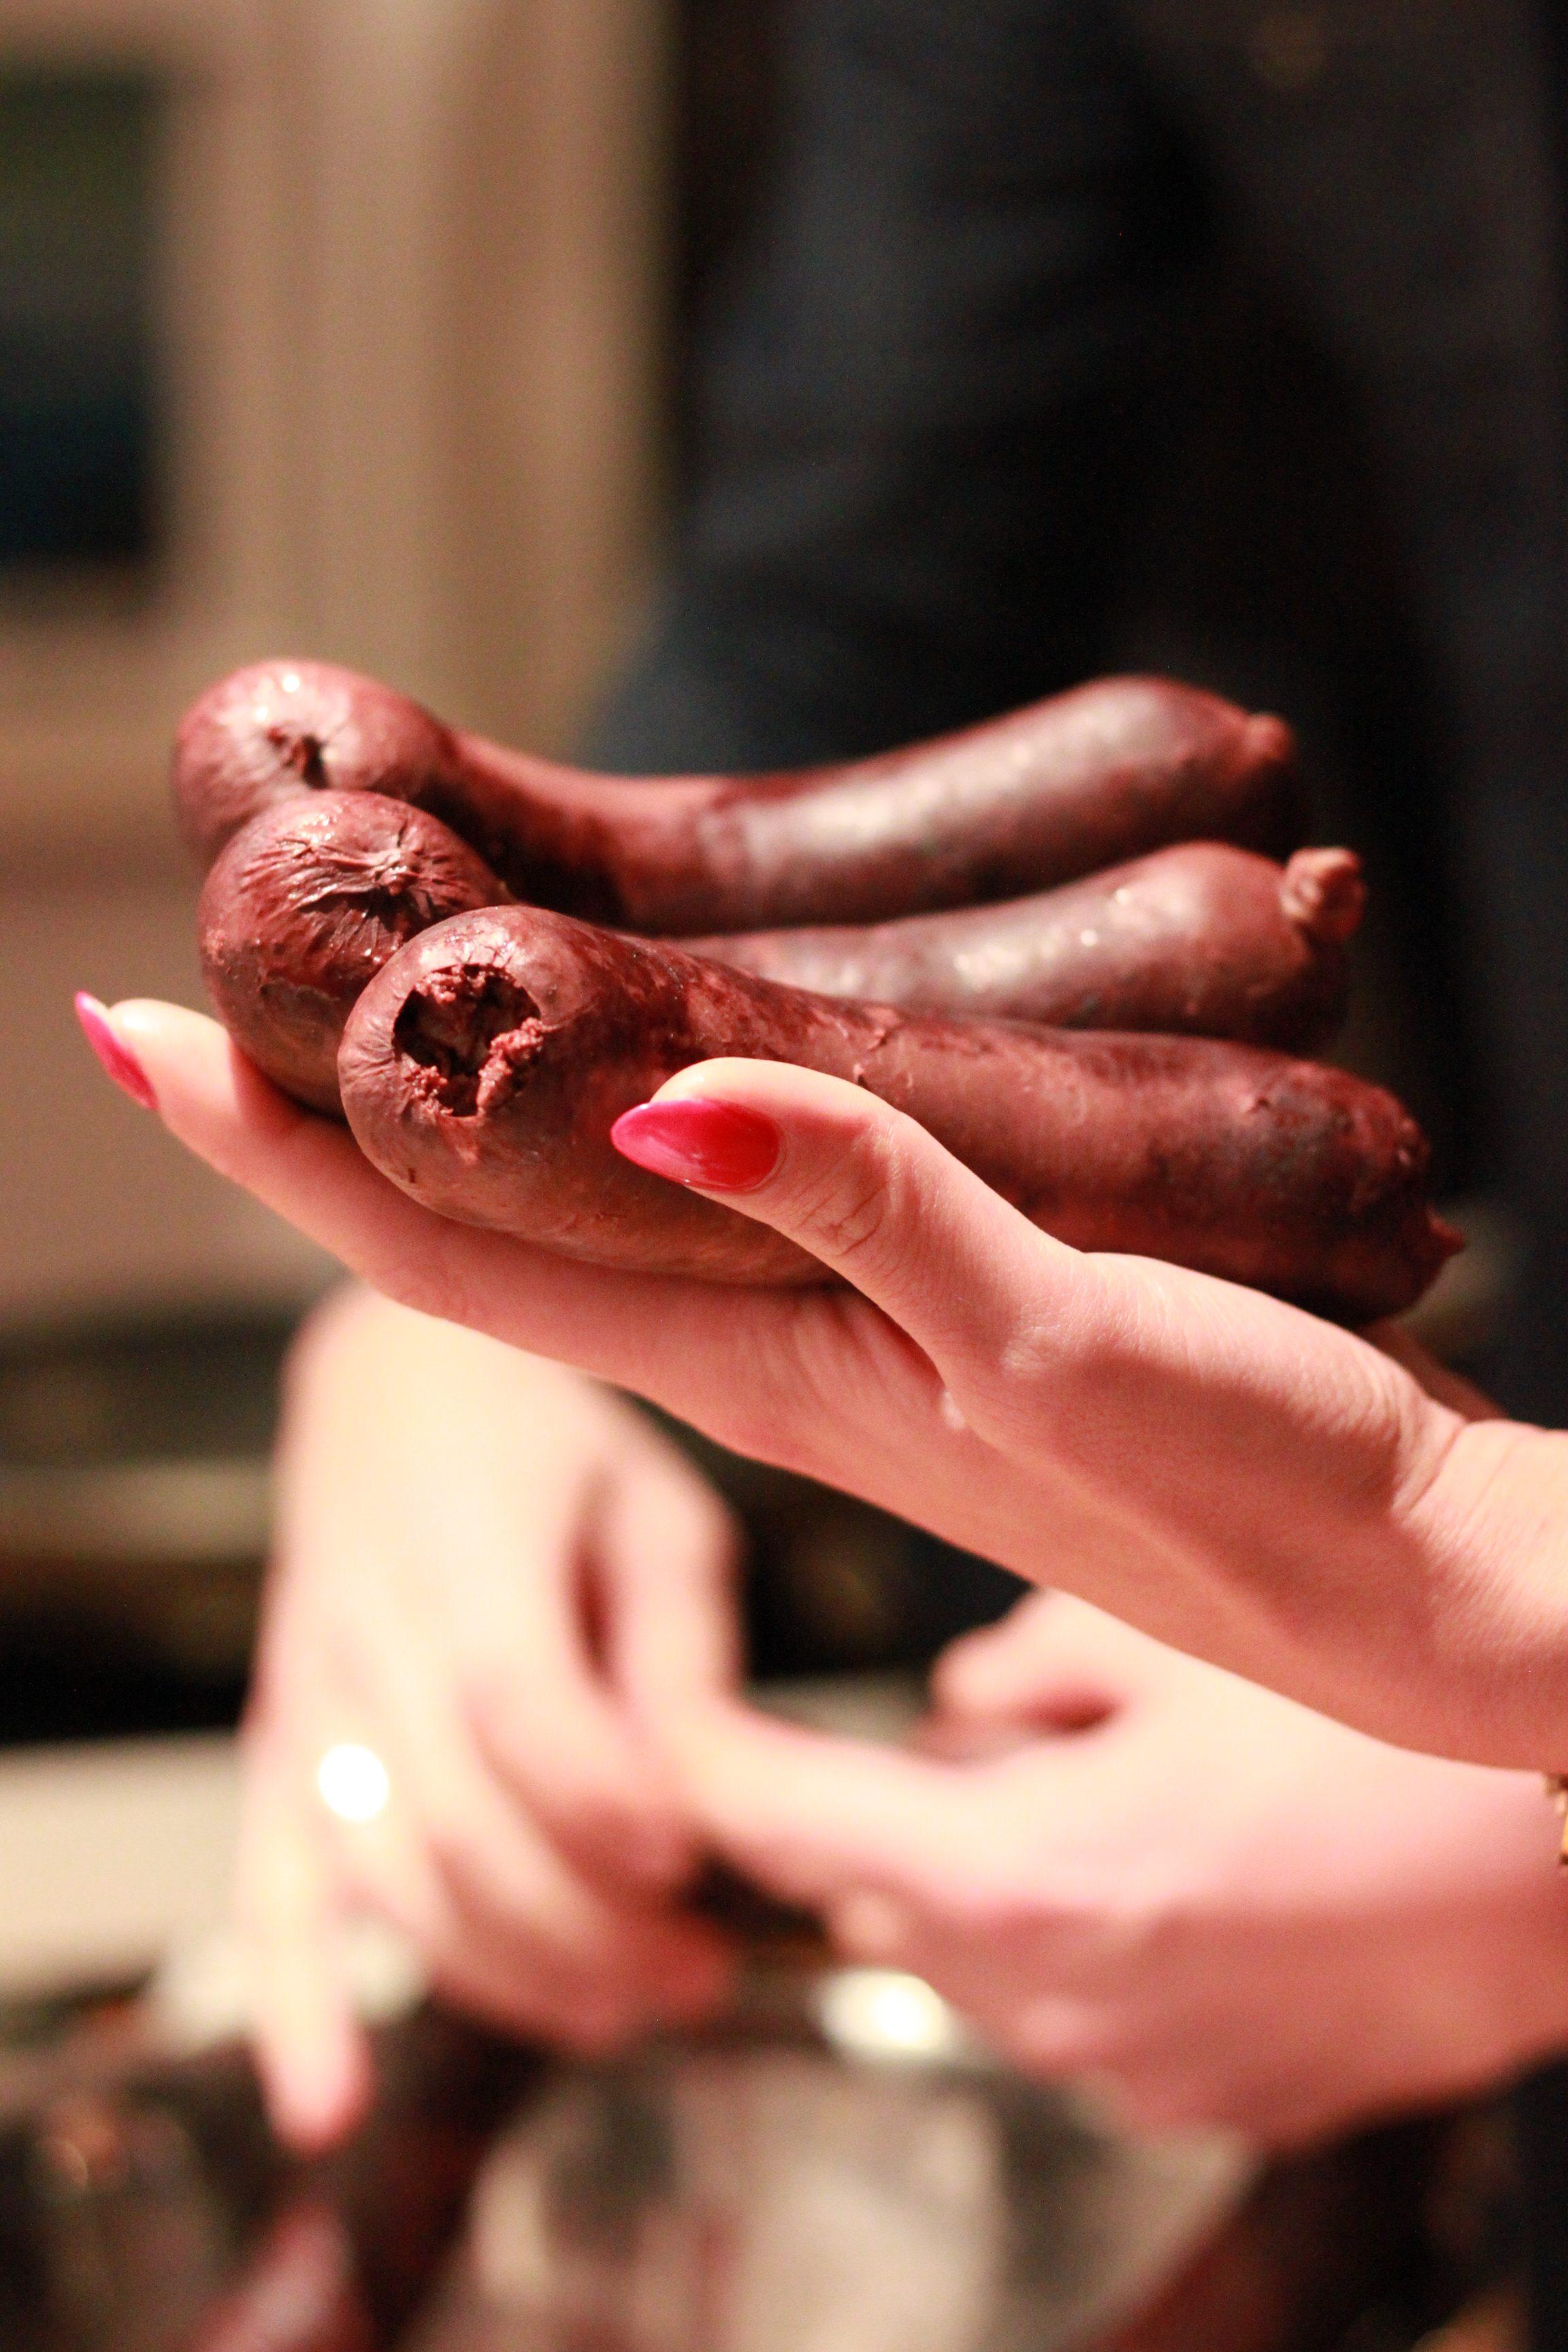 Bloedworst en rode nagels